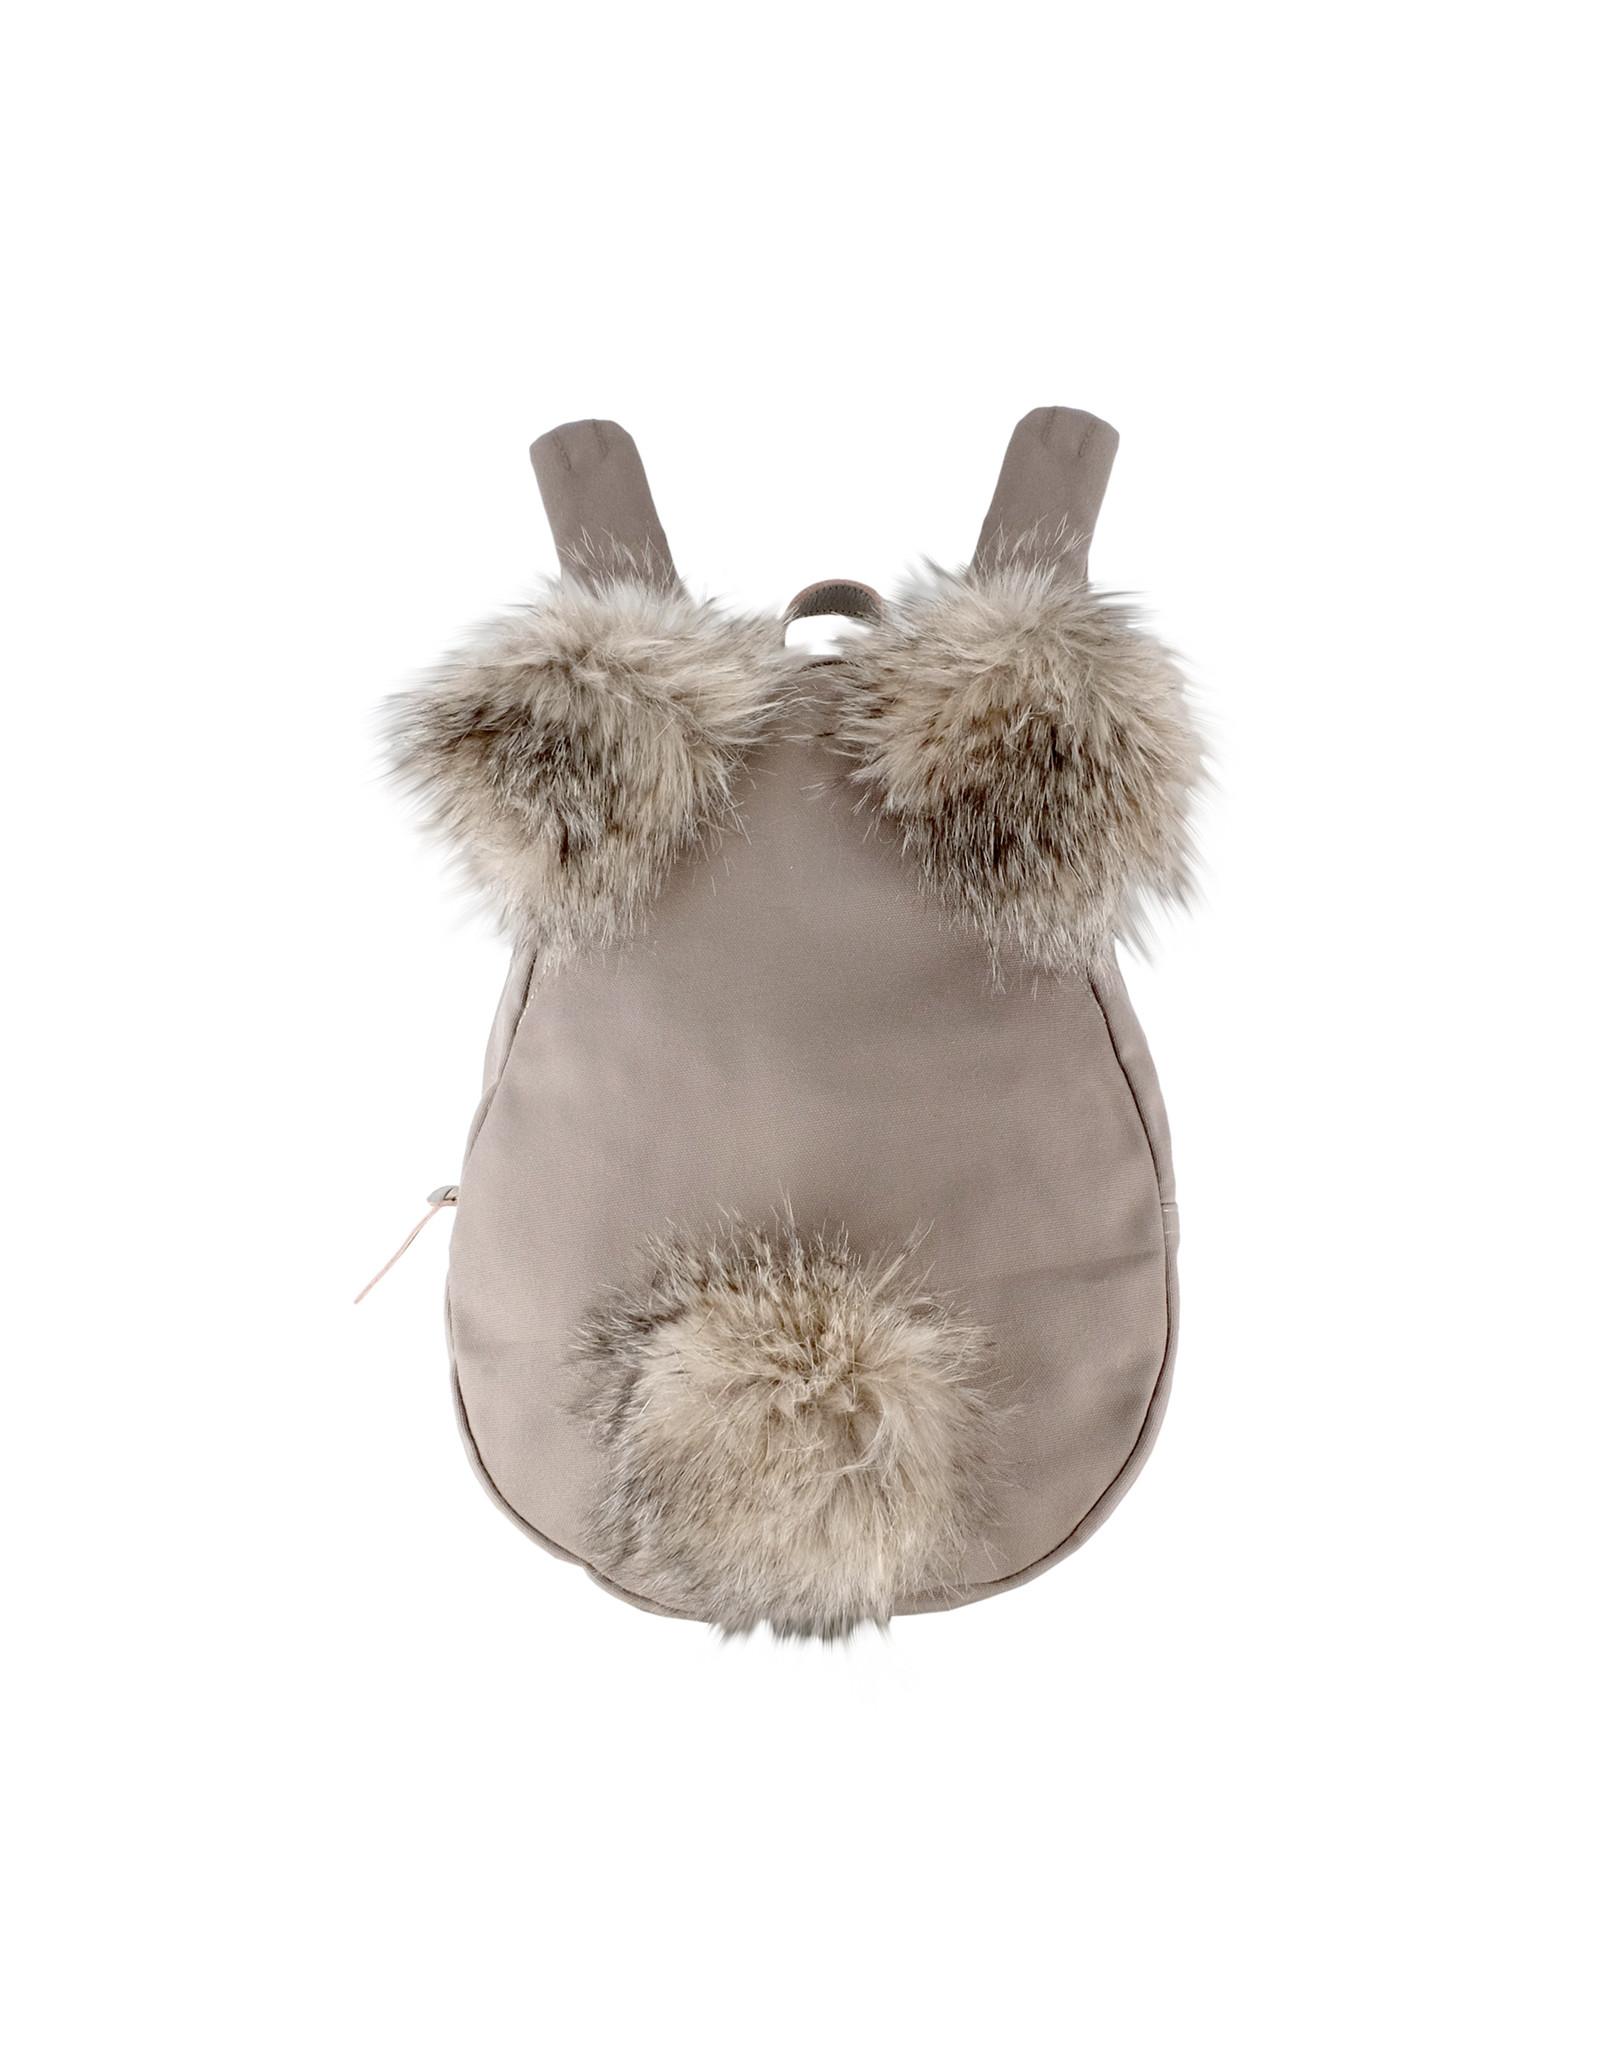 BOUMY AMSTERDAM Boumy - Franckie backpack Koala - Small